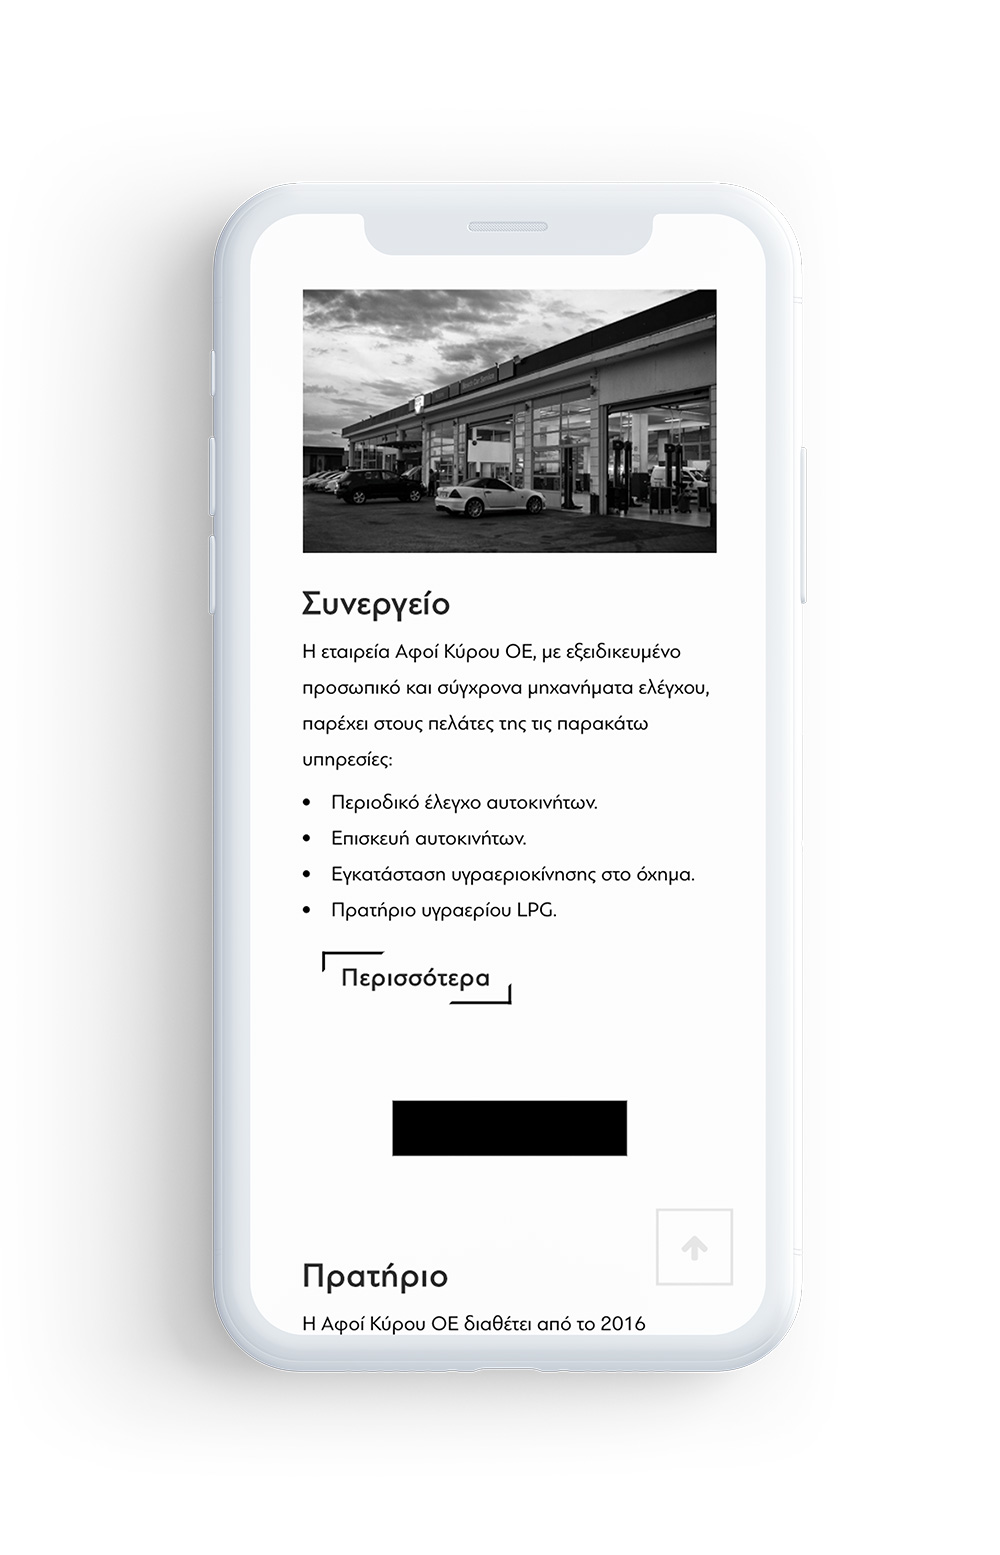 kyrou-project-mobile-2